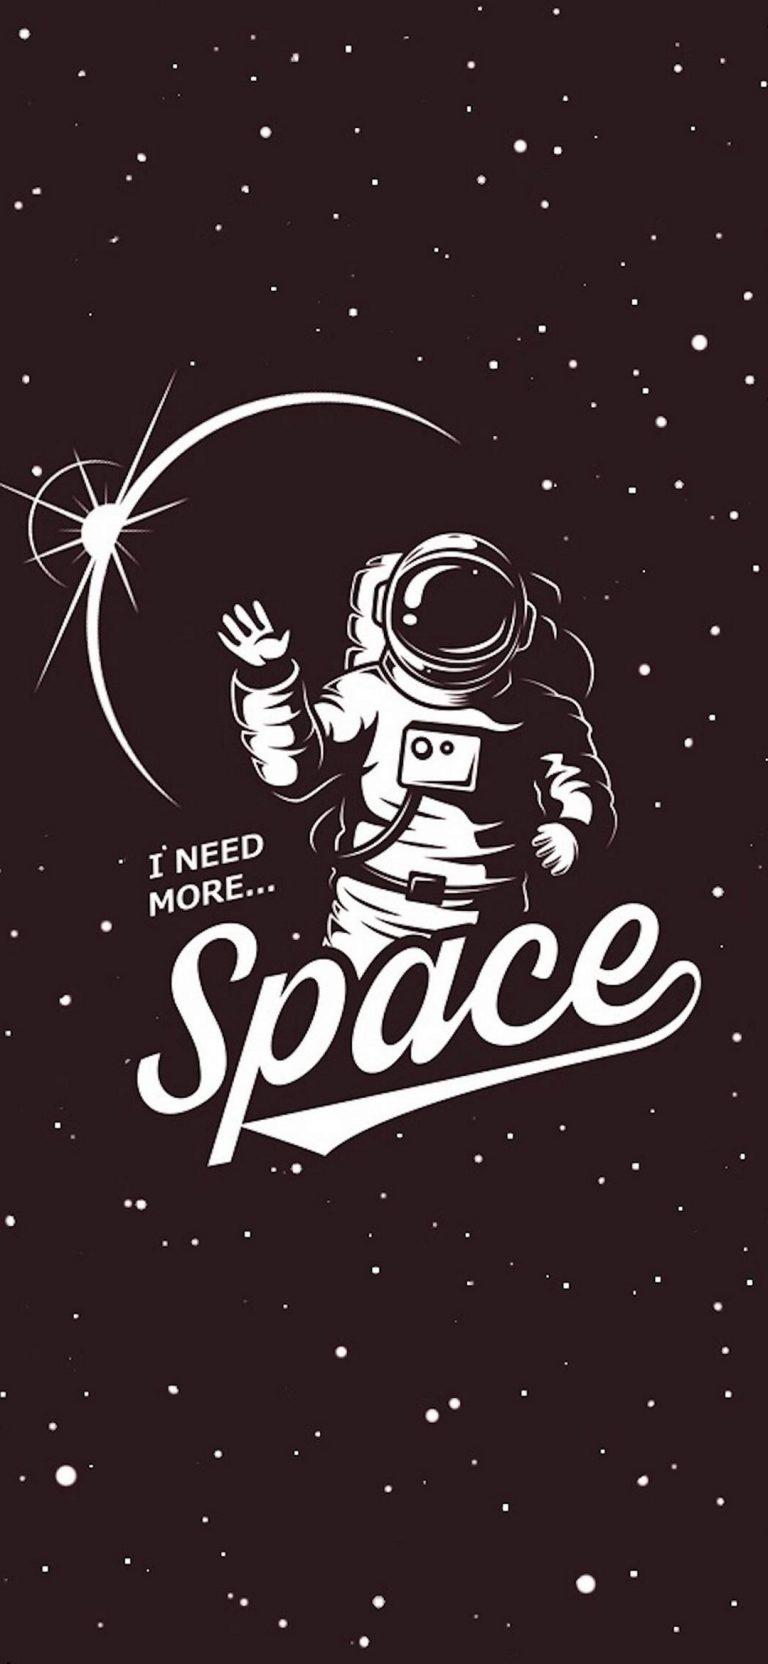 Space Phone Wallpaper 033 1080x2340 768x1664